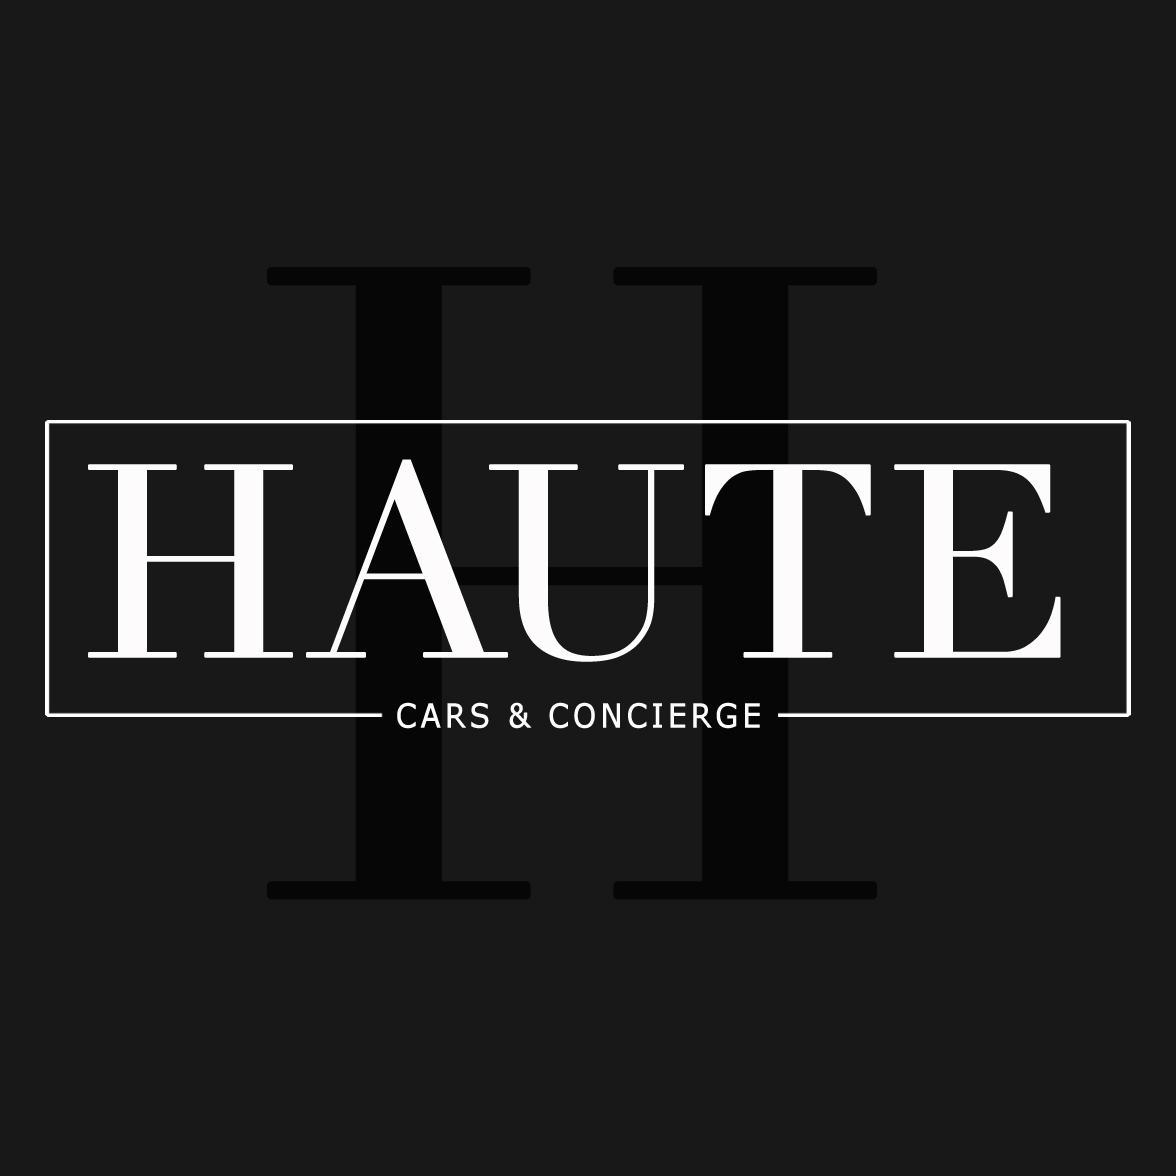 Haute Cars & Concierge